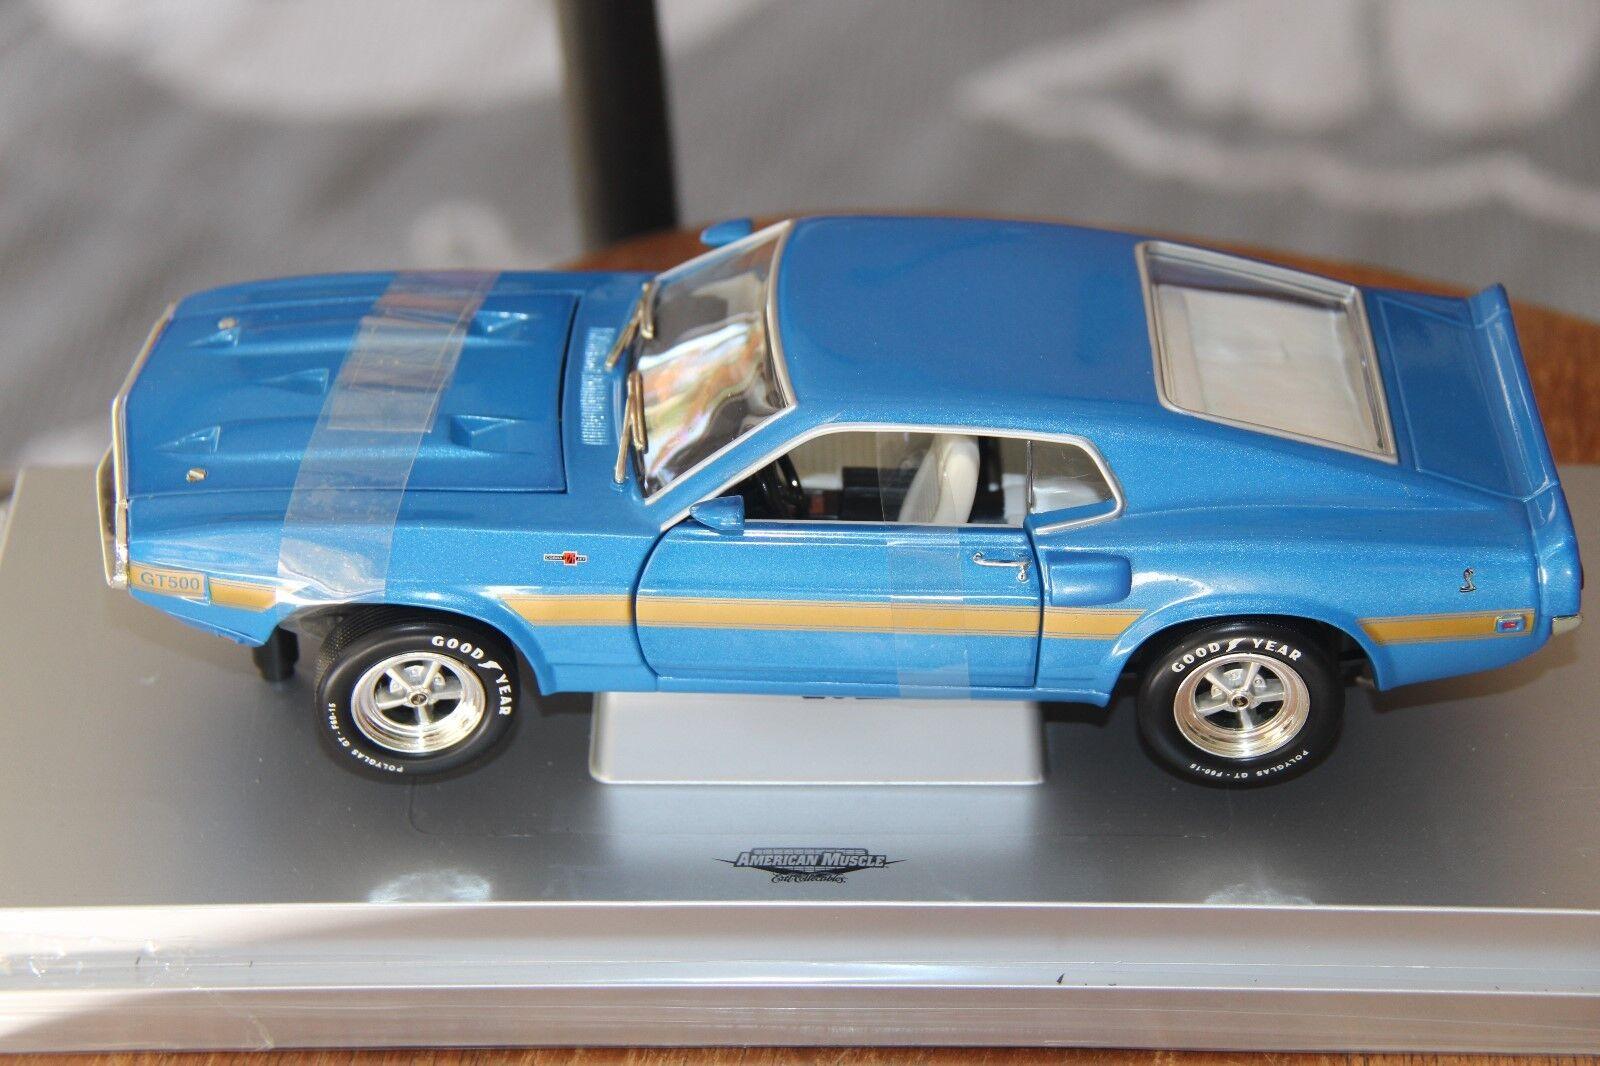 Shelby GT500 1969, bluee gold, ERTL American Muscle 33962, 1 18, Rare Model